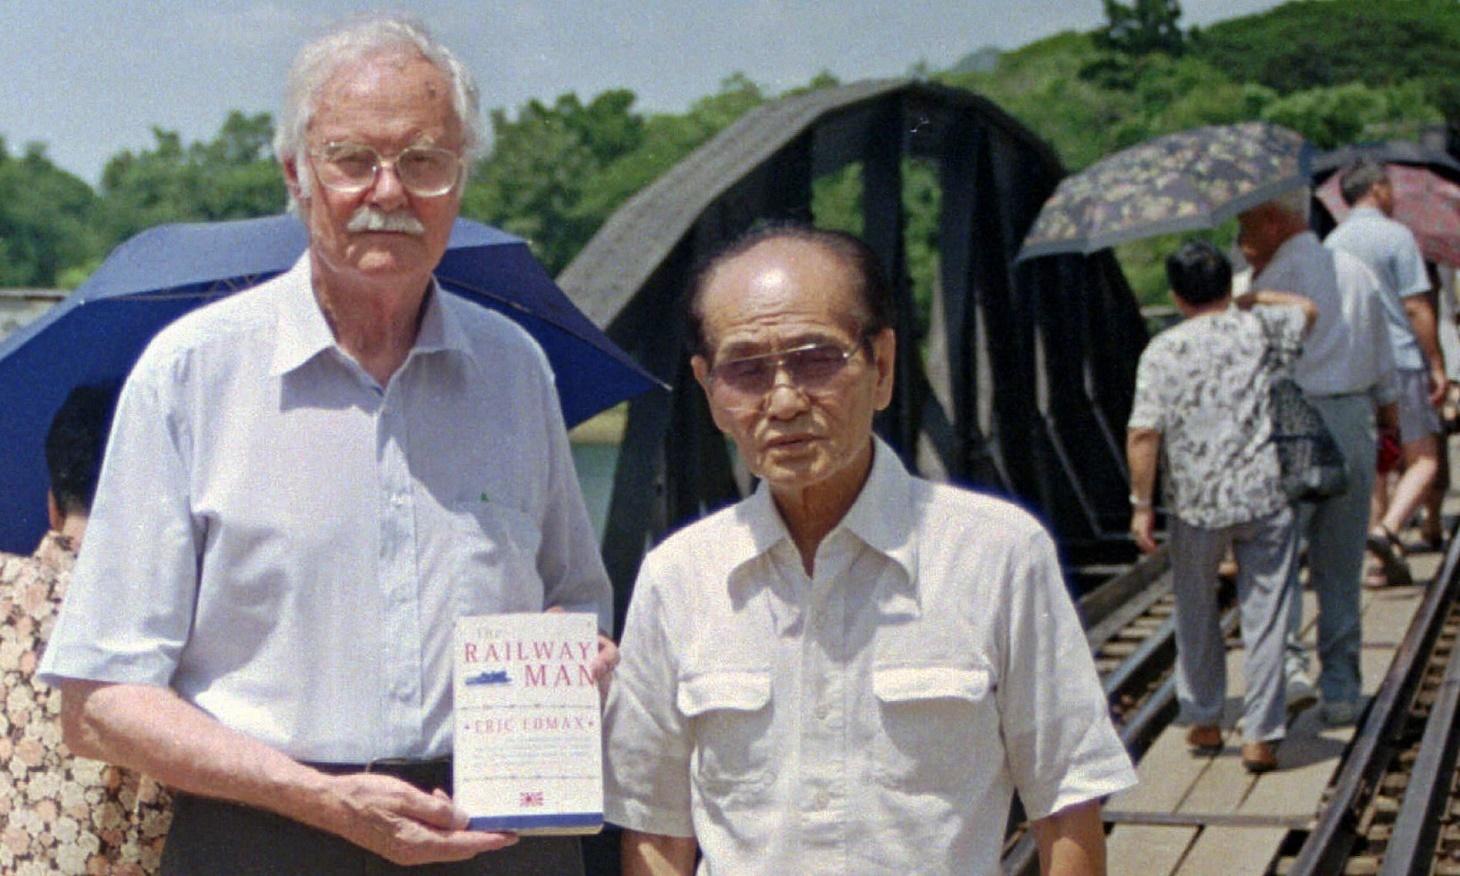 1998 - Eric Lomax a Nagase Takashi